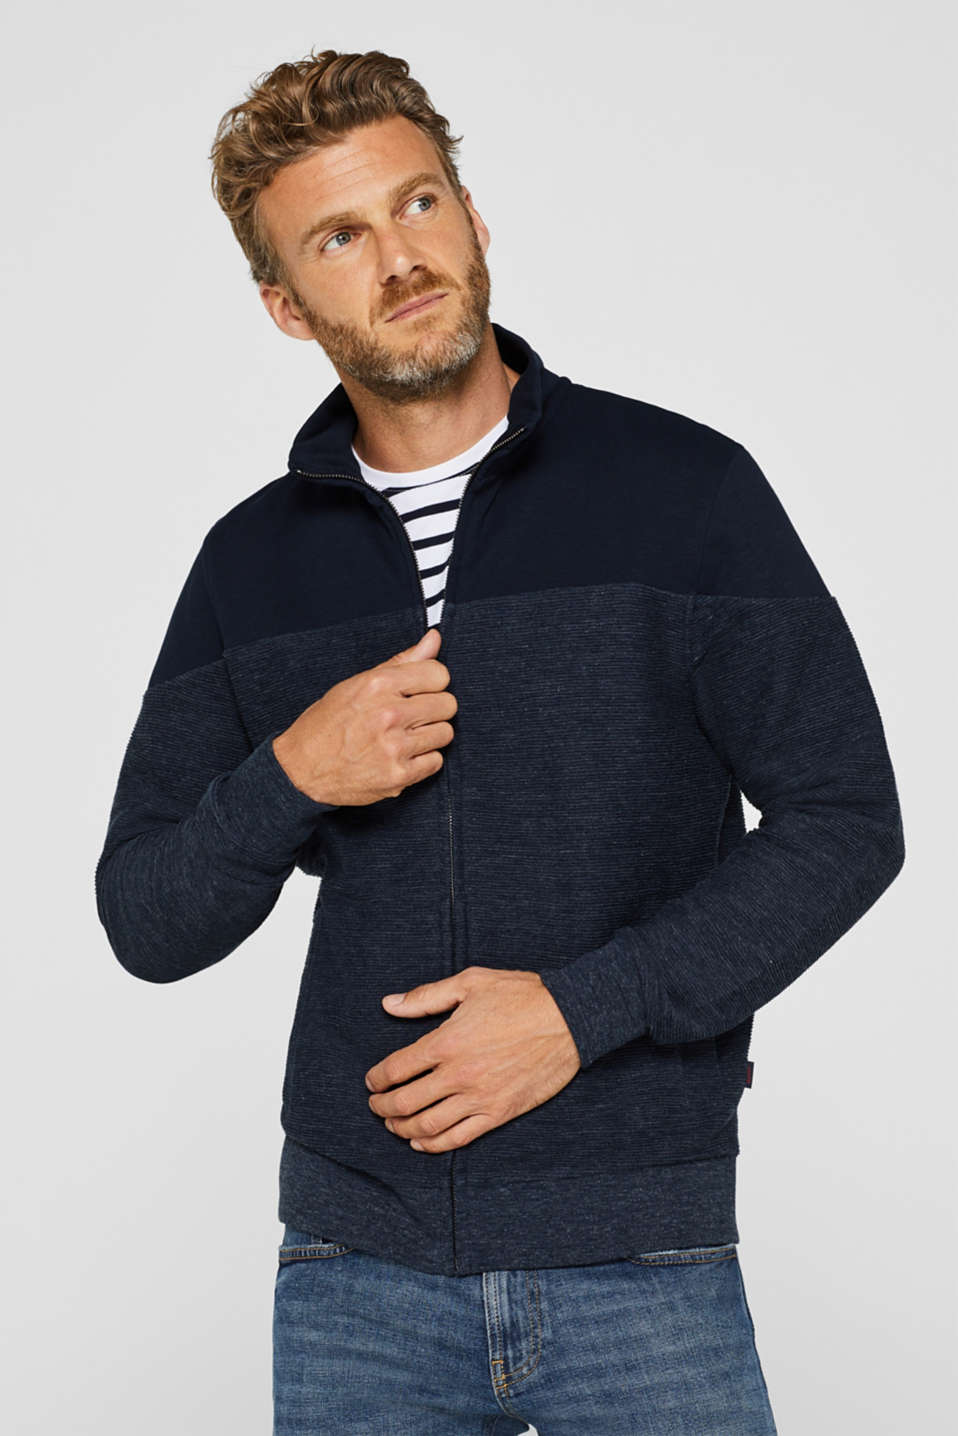 Sweatshirt cardigan with organic cotton, NAVY, detail image number 0